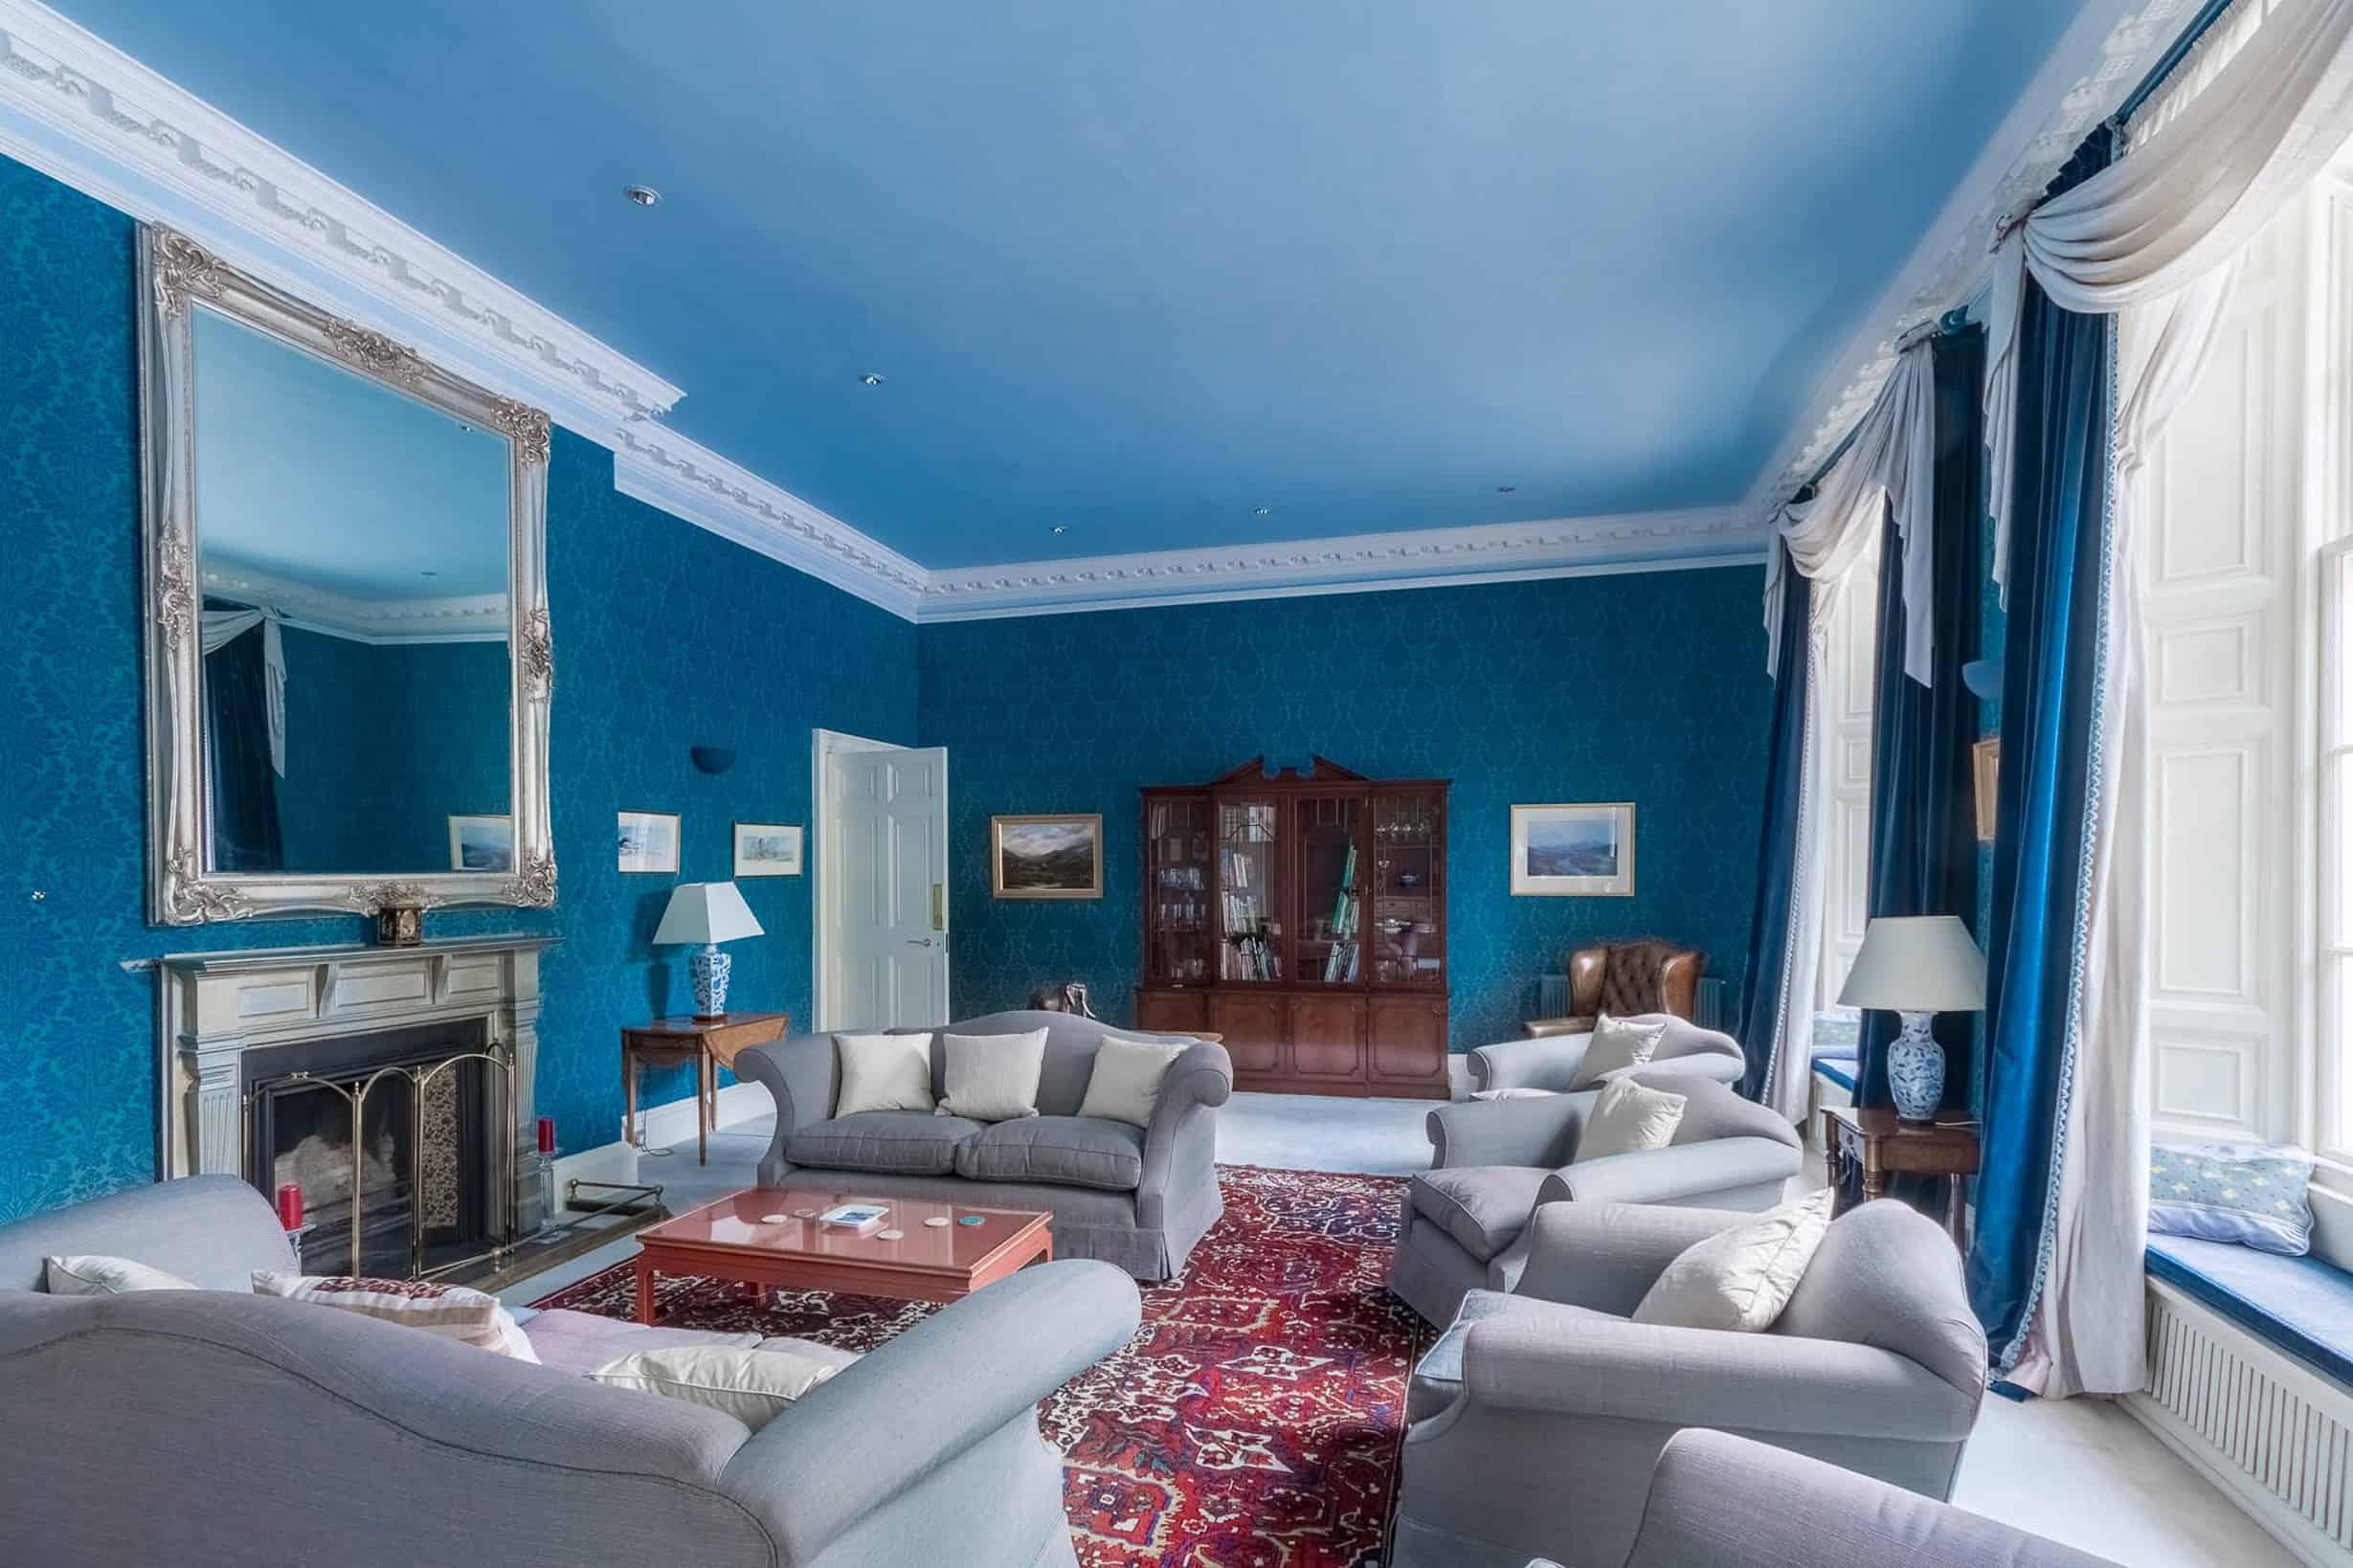 Reception Room at Blervie House